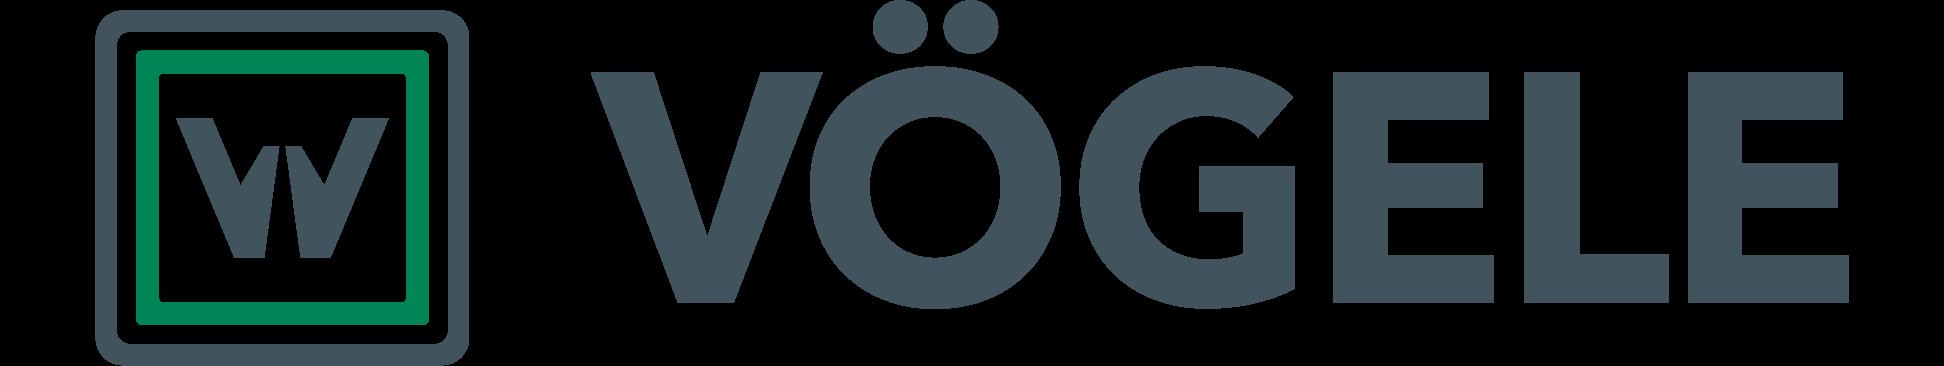 Vogele - Papé Machinery Construction & Forestry